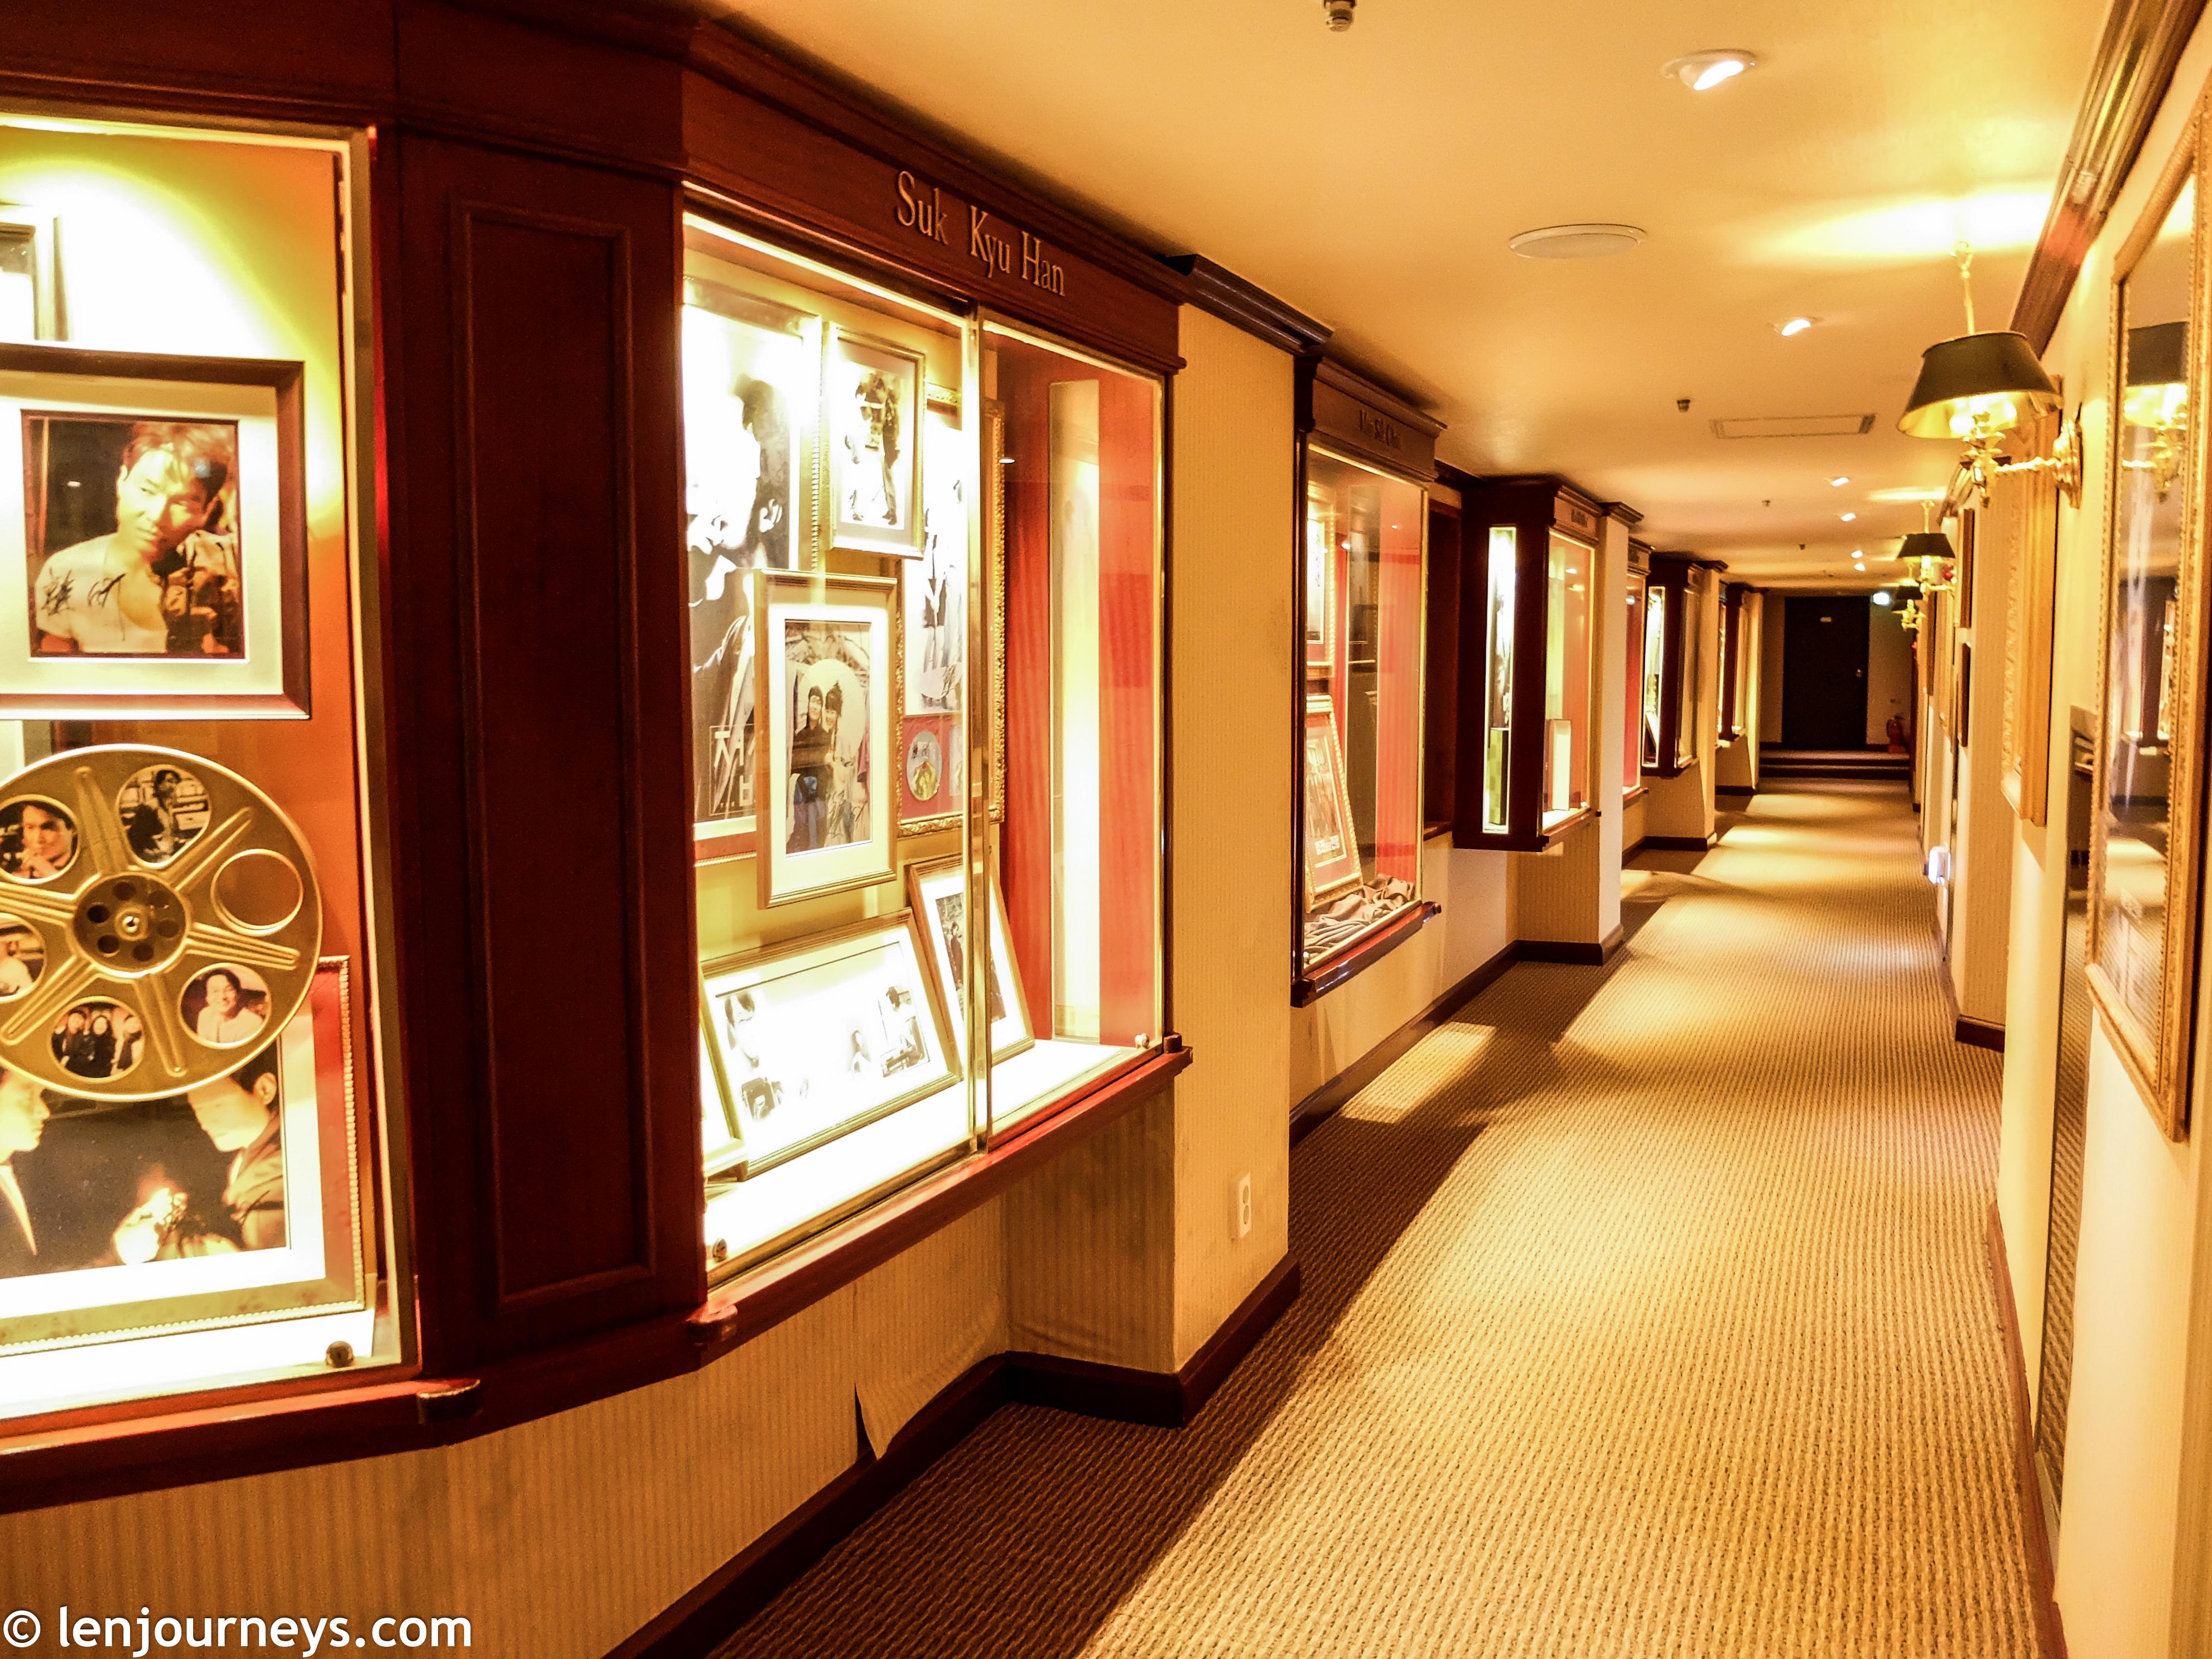 The hallway of Kensington Star Hotel